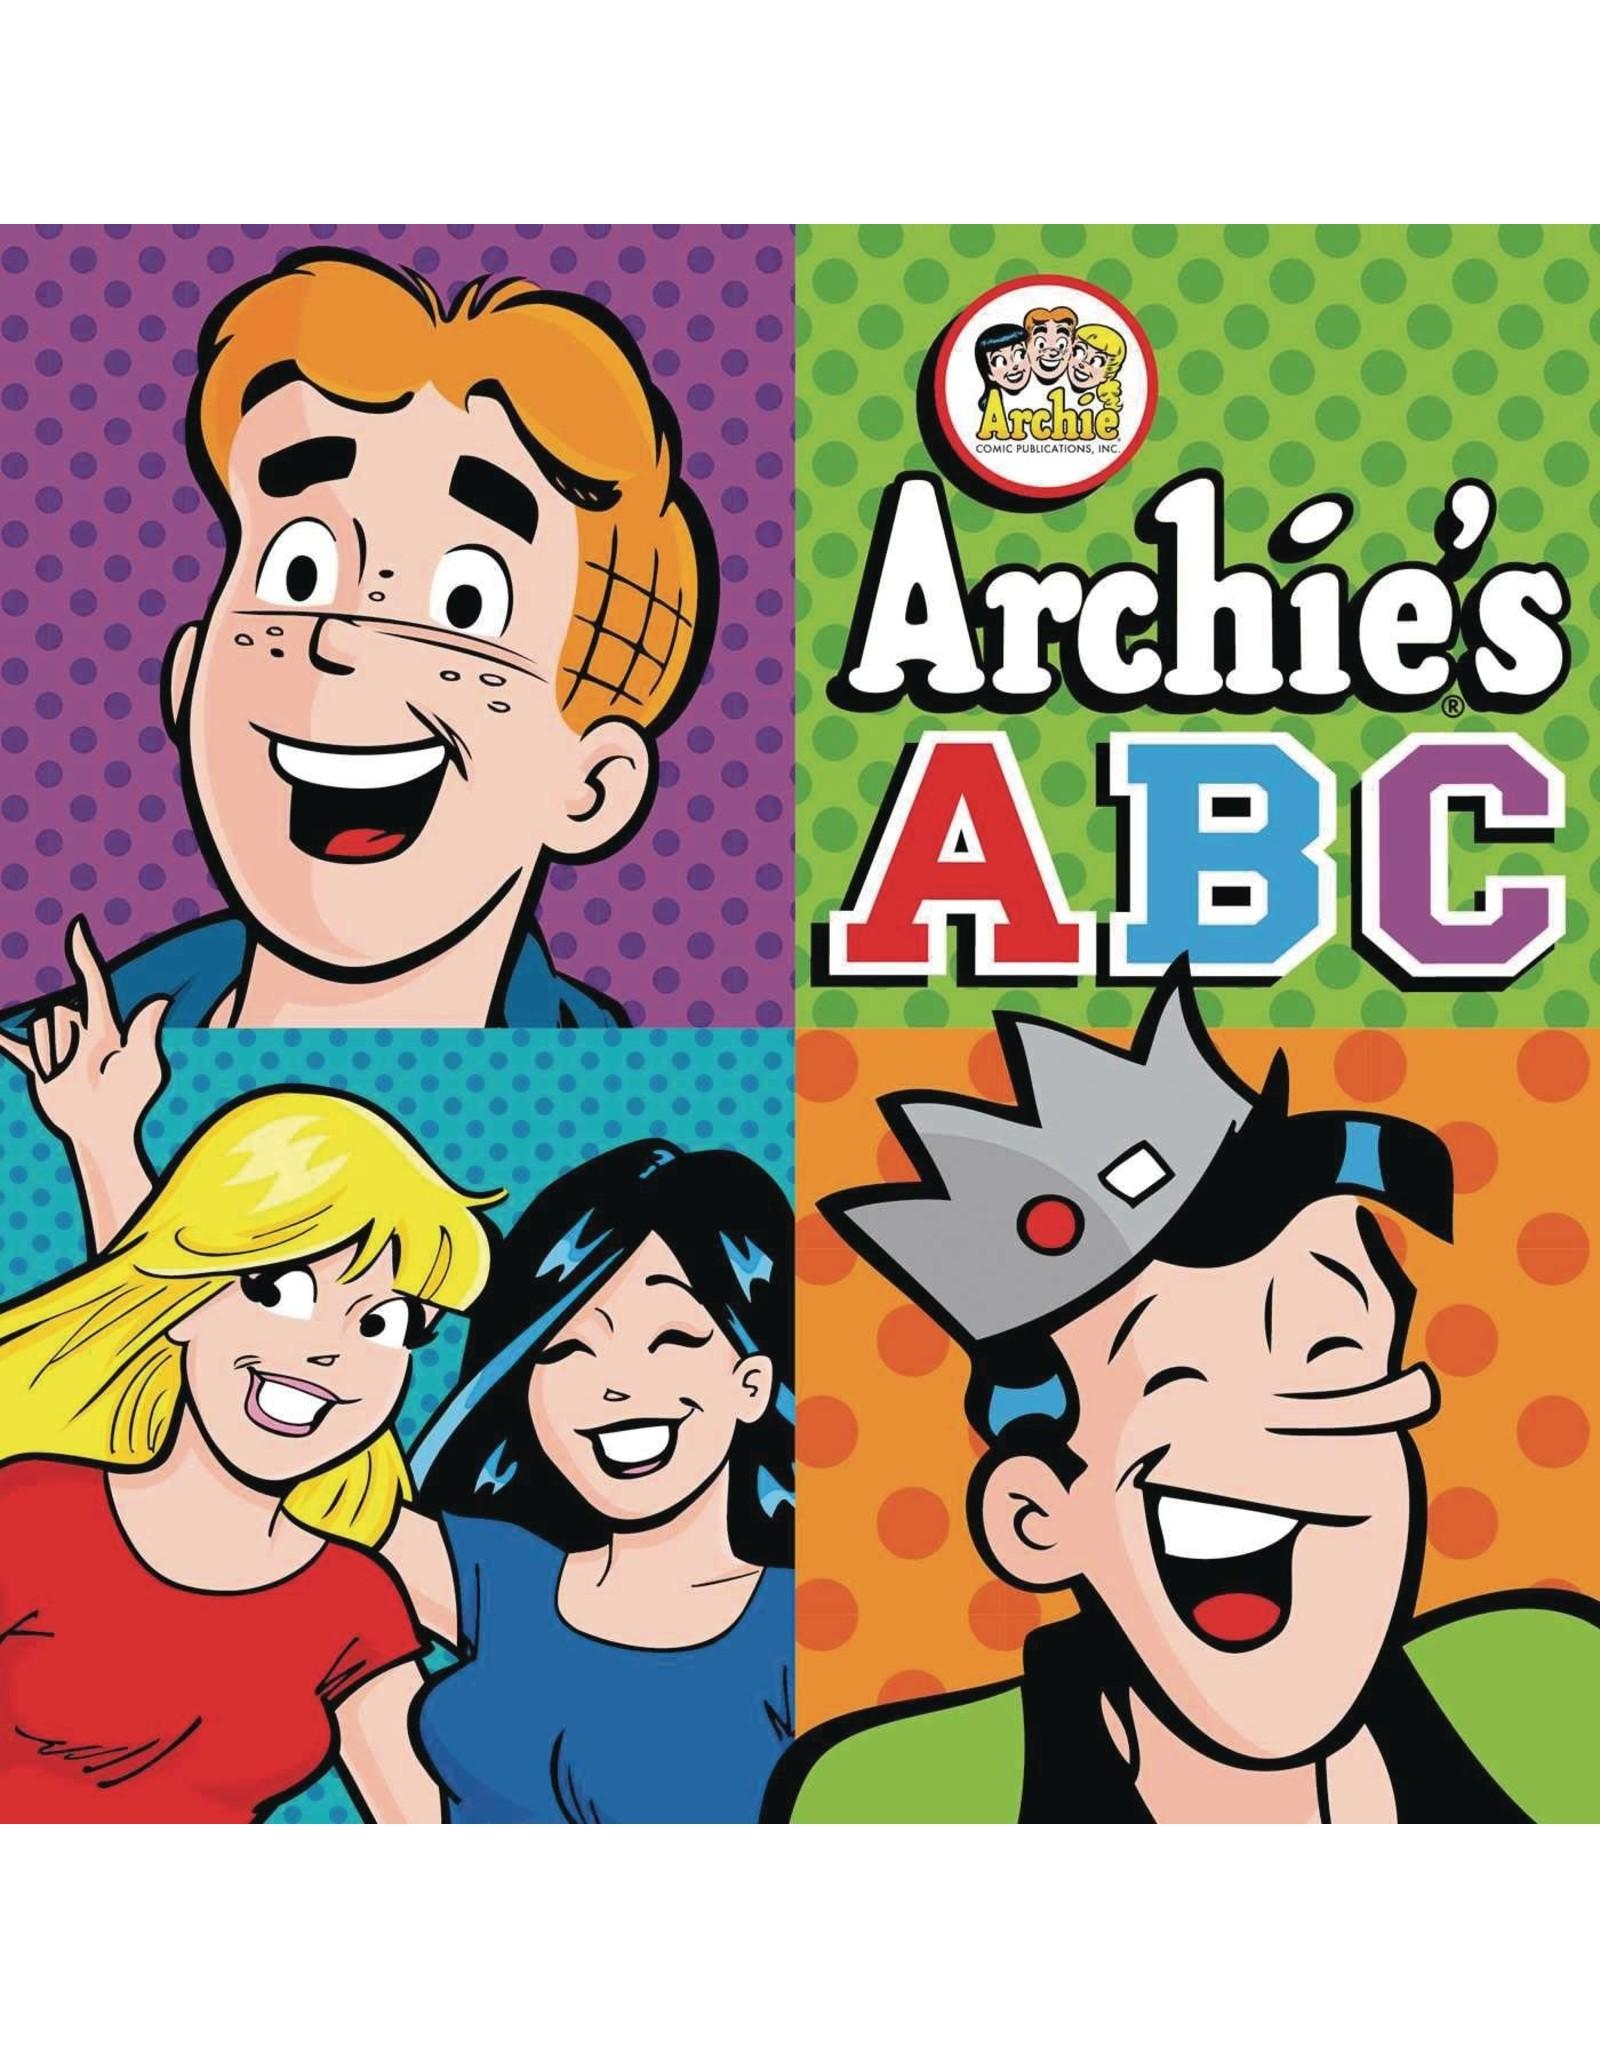 ARCHIES ABC BOARD BOOK